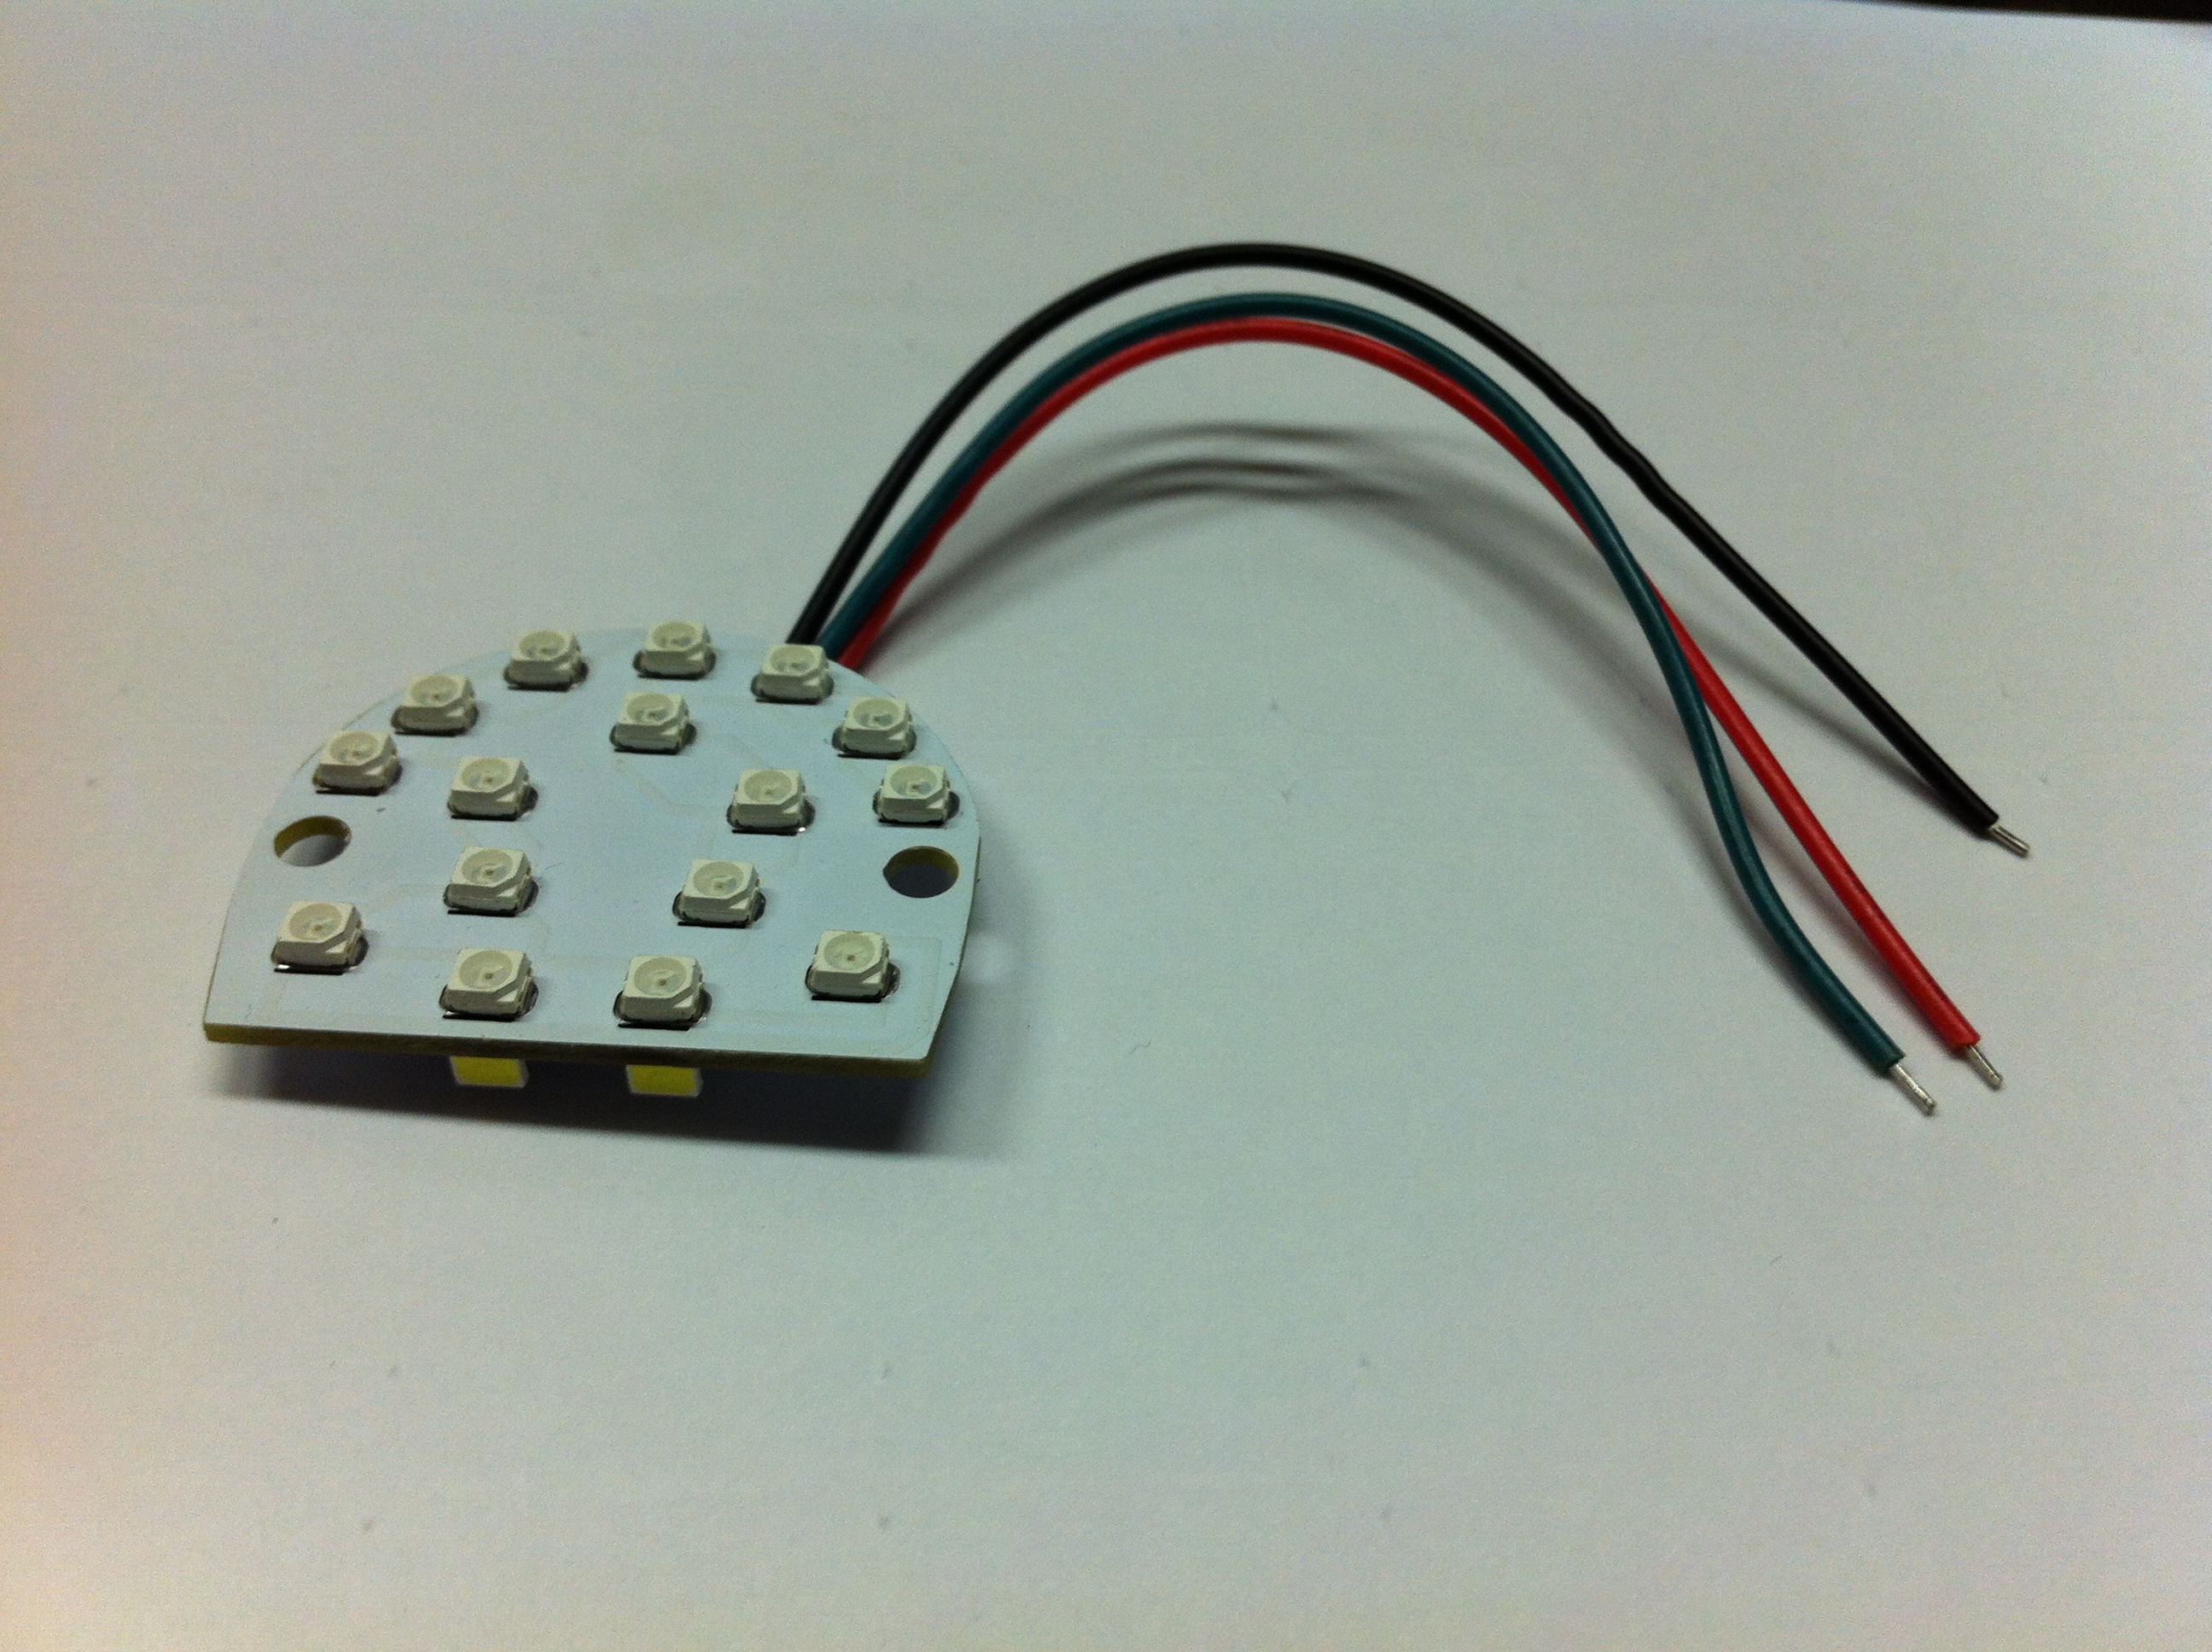 Classic Dynamo Regulator Conversions Wiring Light Board Some